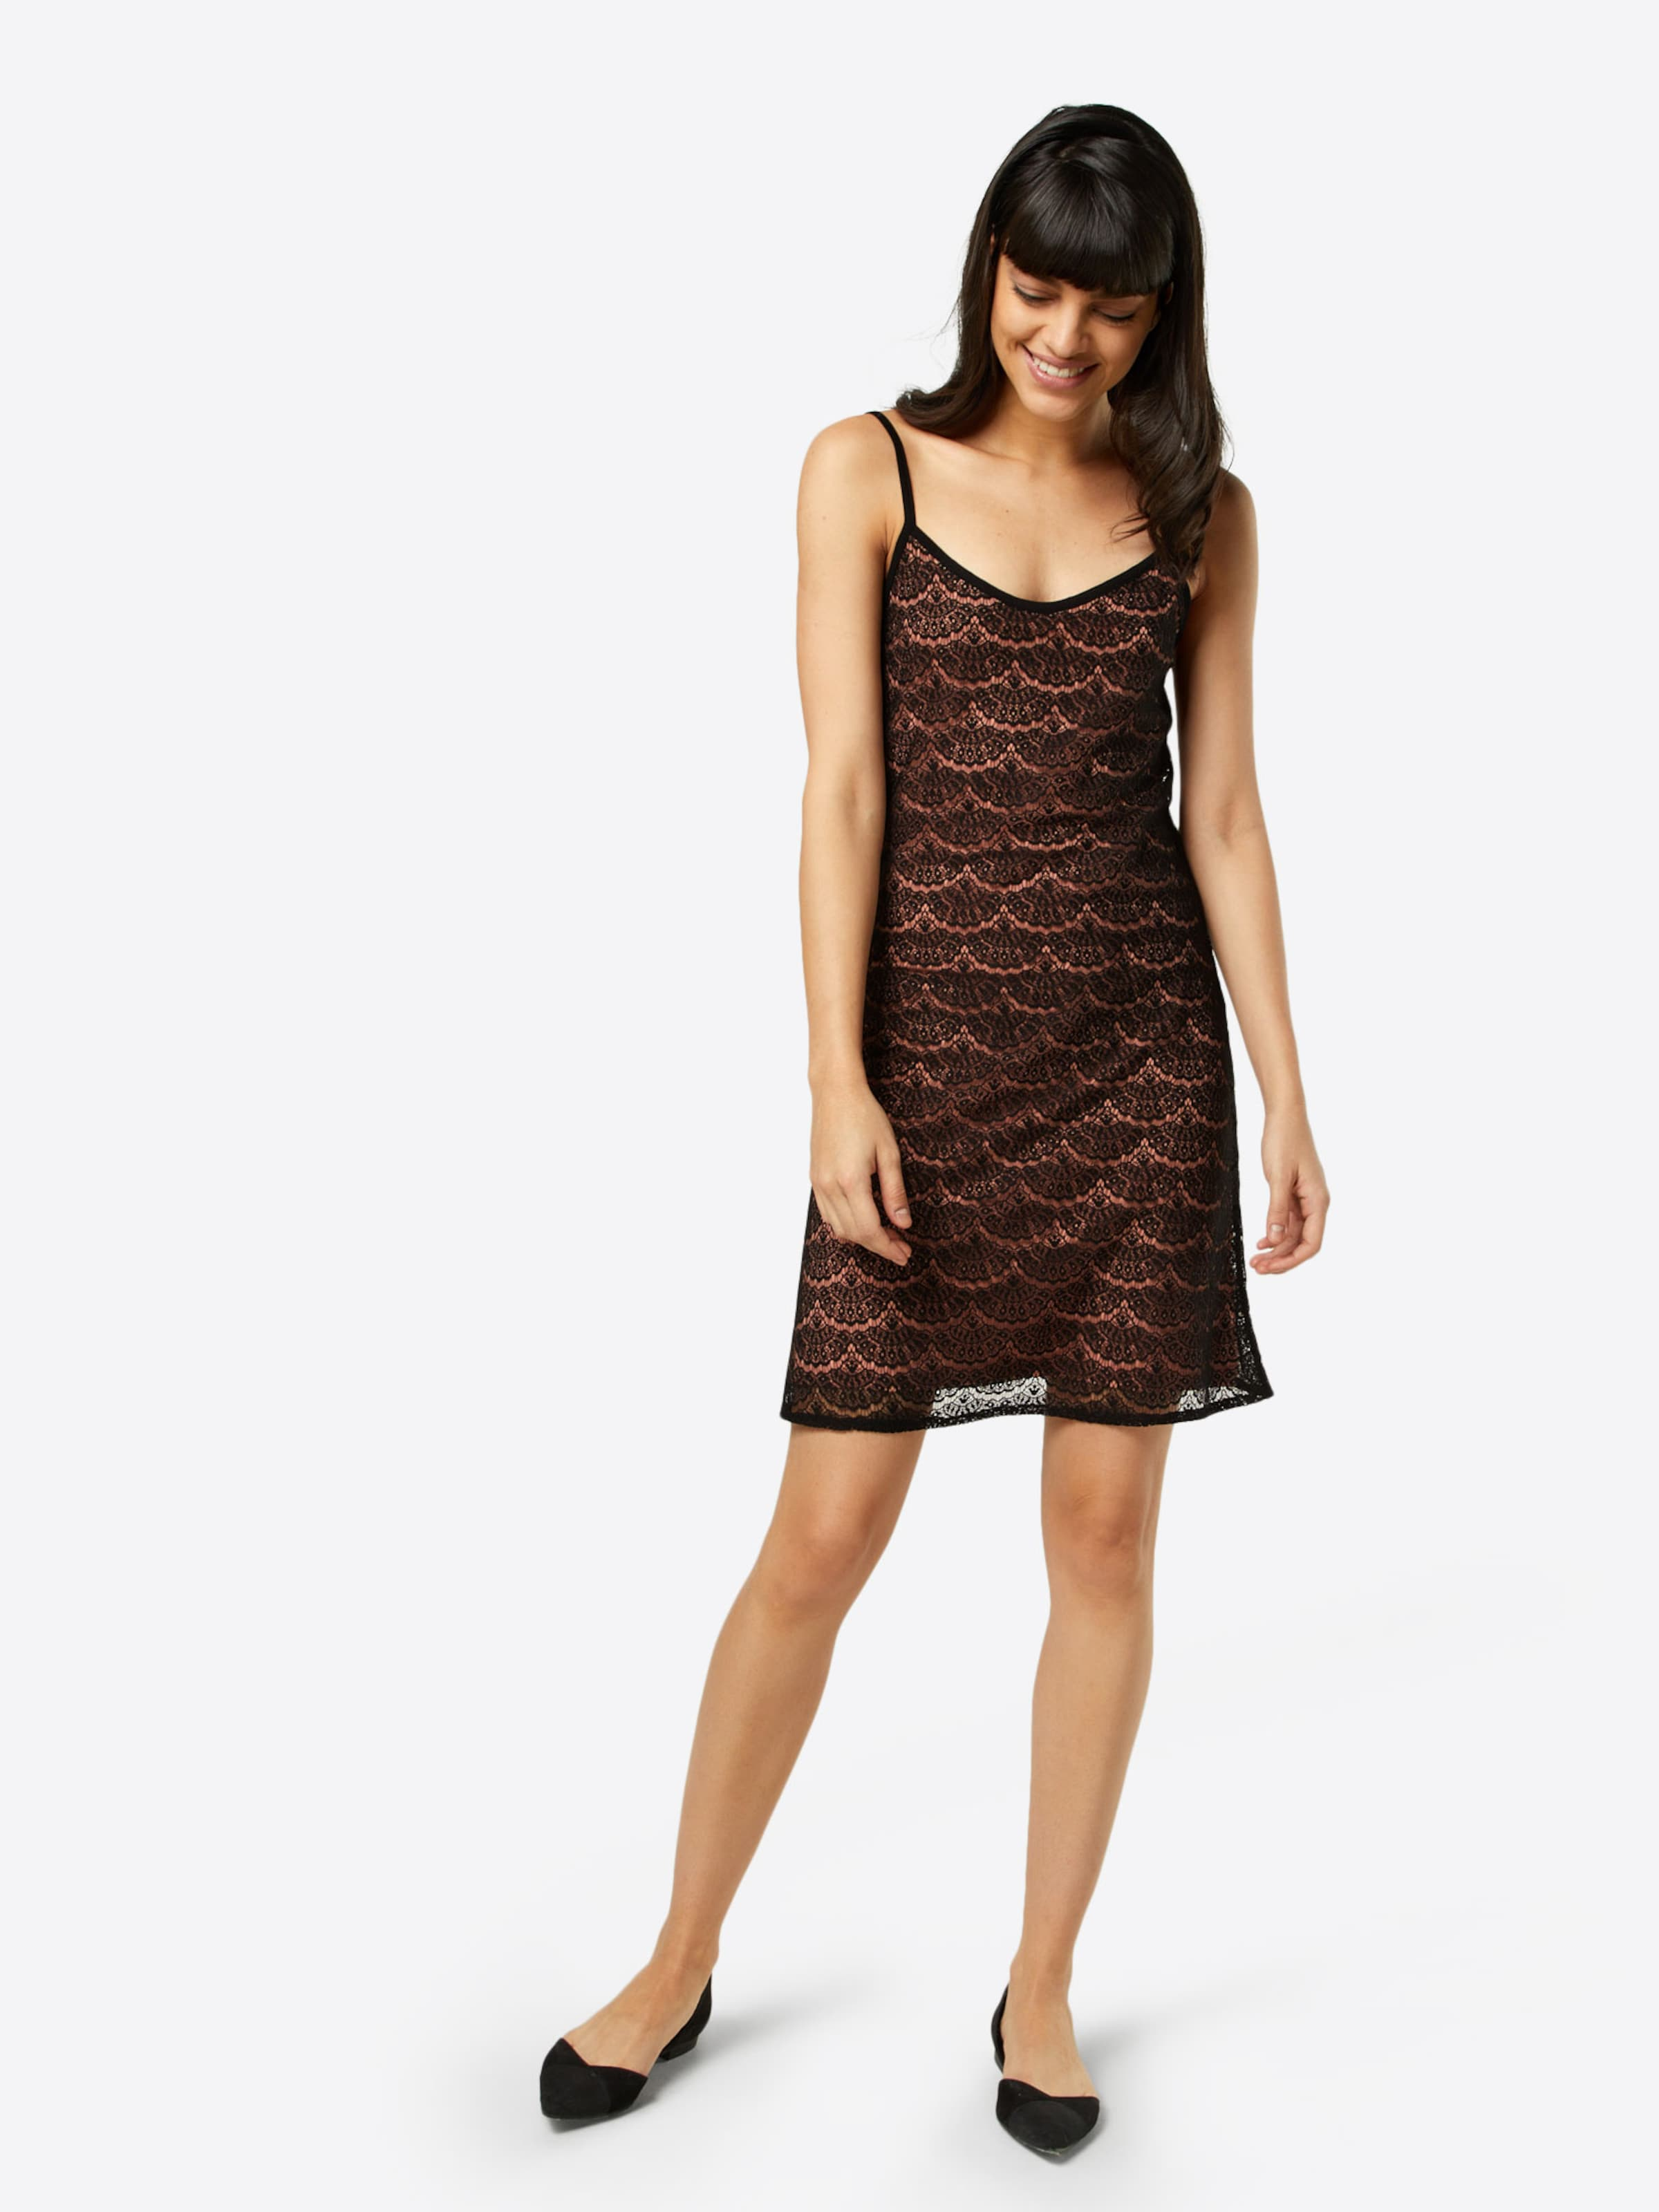 Schwarz Kleid In 'leandra' You About c5ARLS34qj